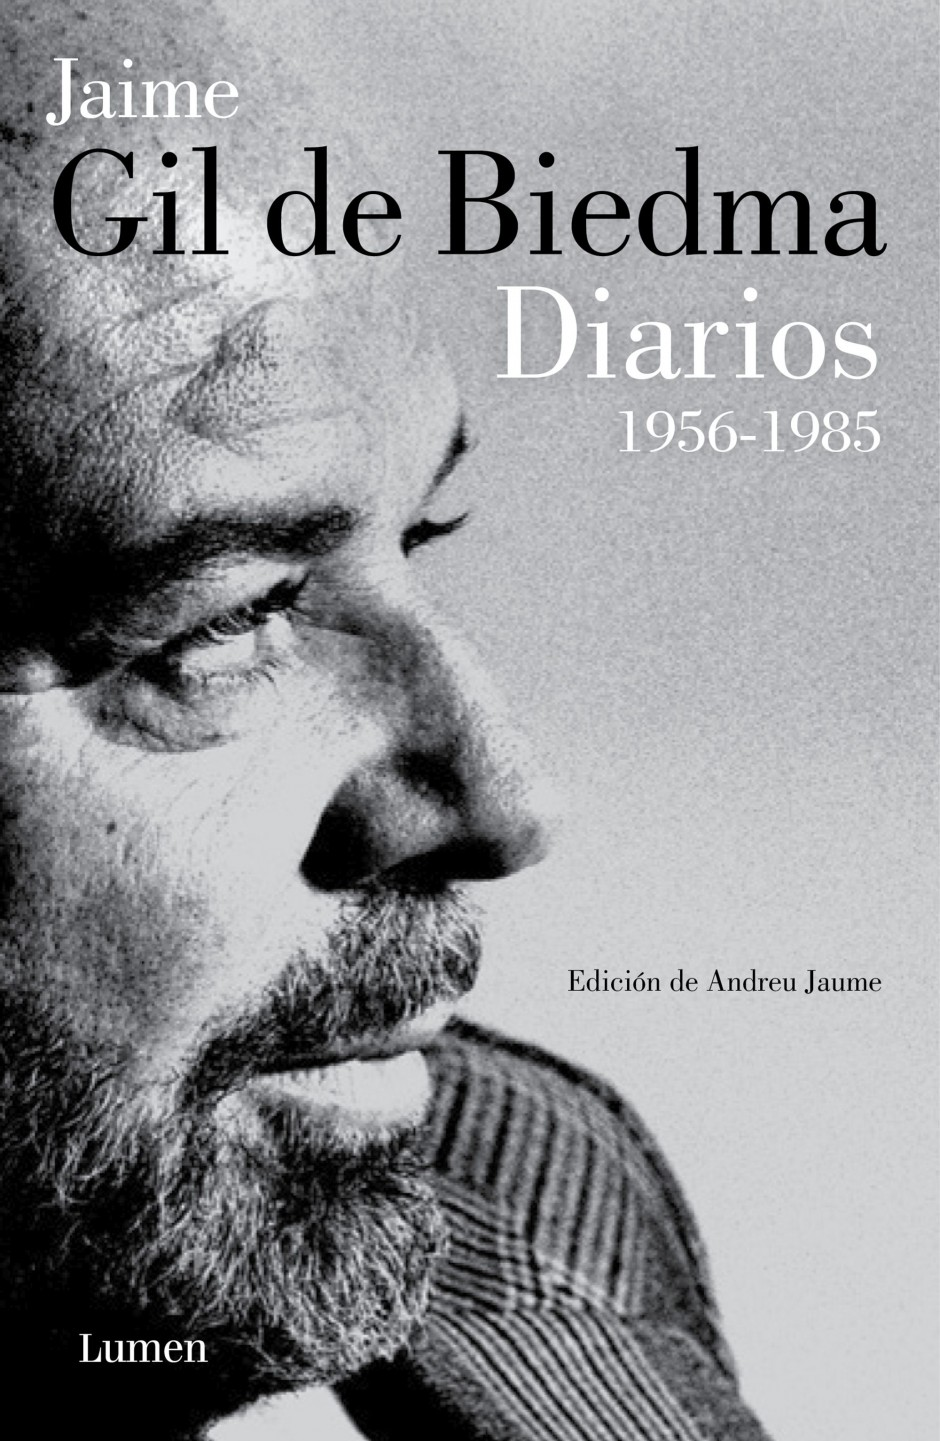 Jaime Gil de Biedma, Diarios 1956-1985